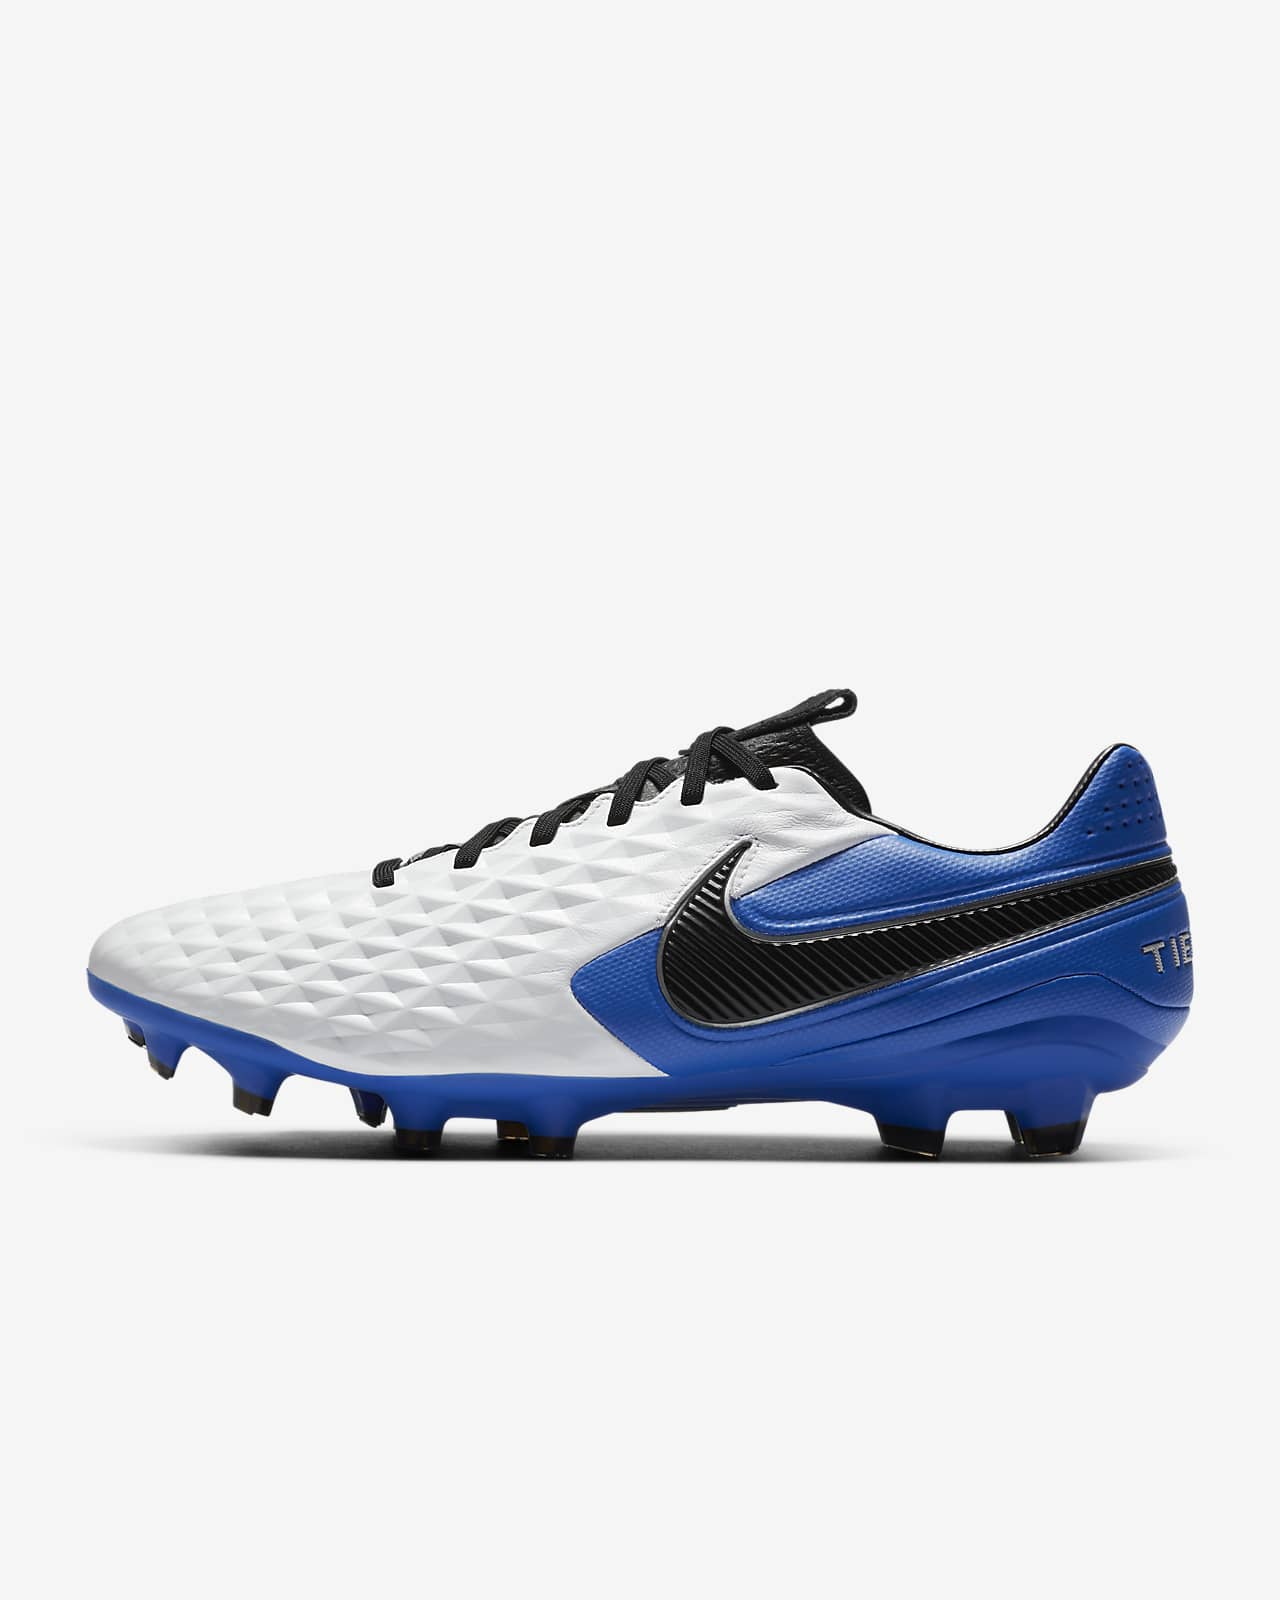 local Sotavento piloto  Nike Tiempo Legend 8 Pro FG Firm-Ground Football Boot. Nike SK